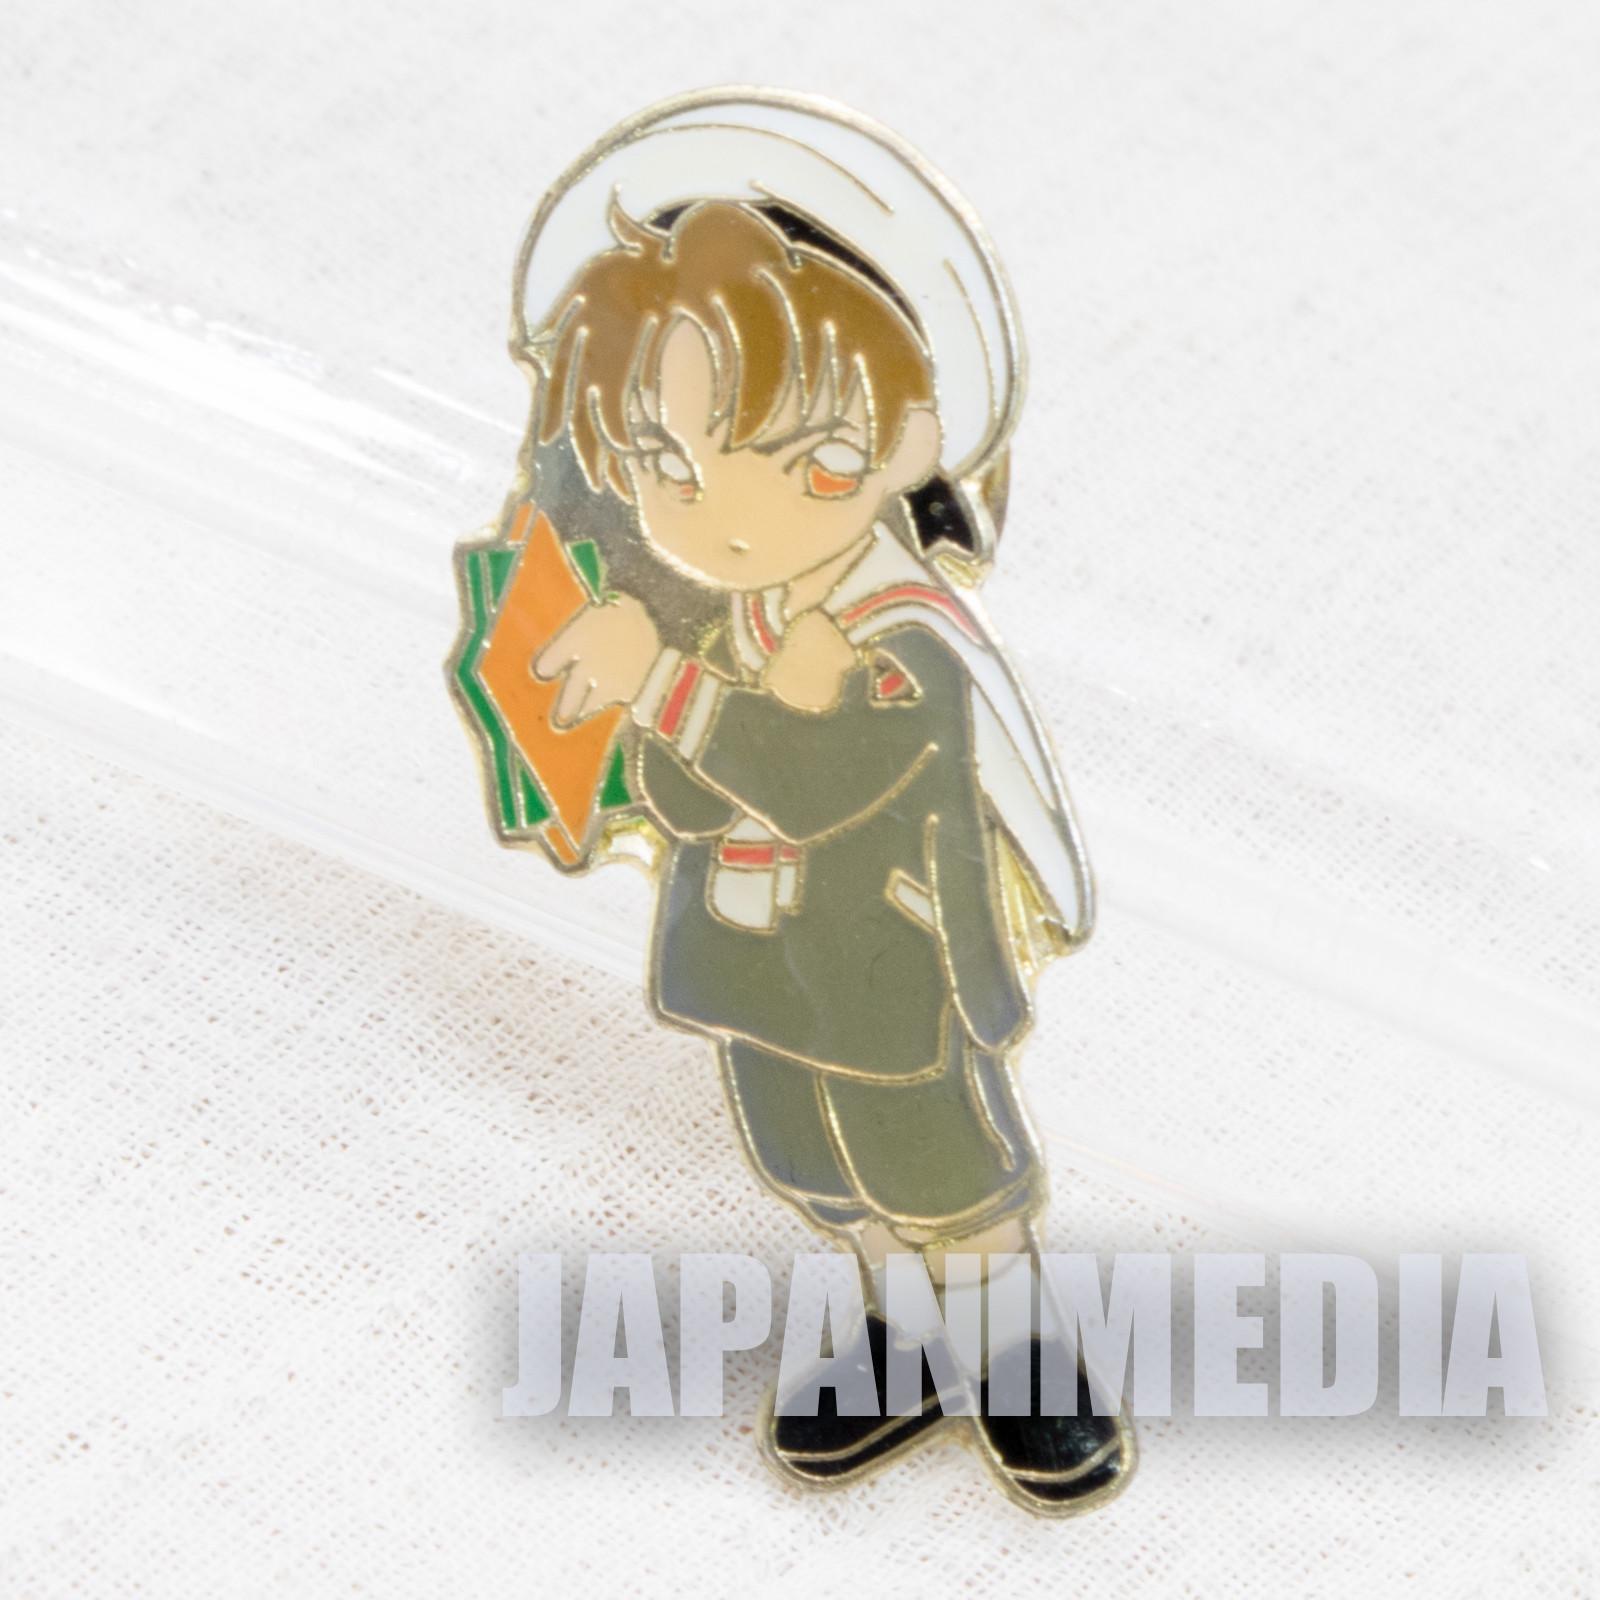 Cardcaptor Sakura Syaoran Li Sakura Pins (School uniform ver.) CLAMP JAPAN ANIME #13